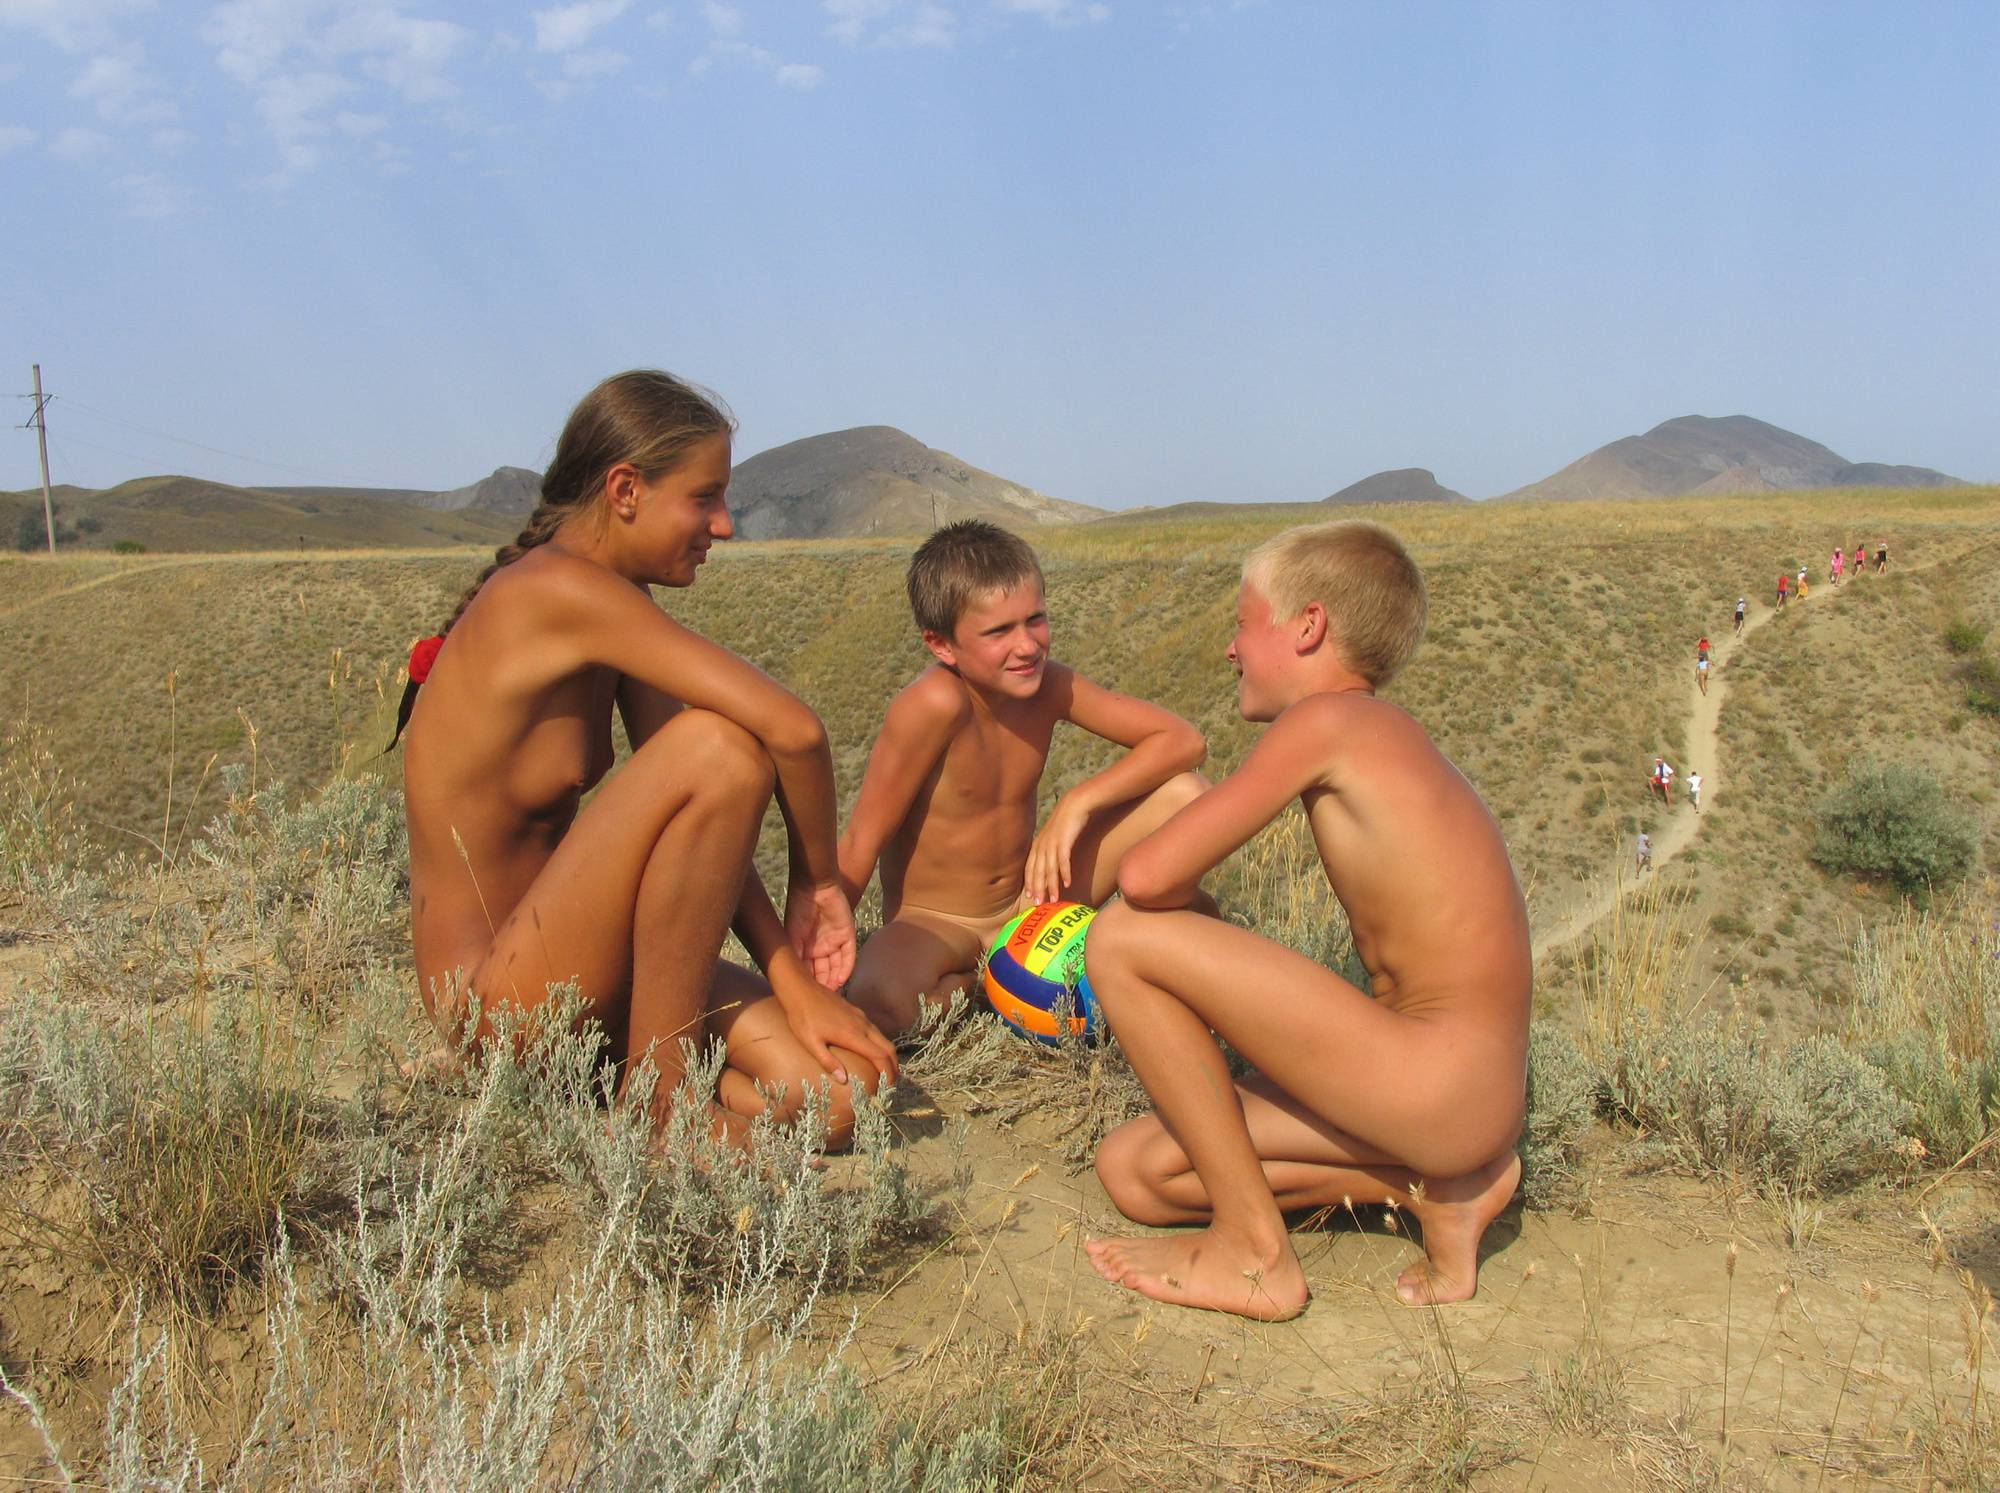 Pure Nudism Photos-Nude Mountain Group Hike - 1